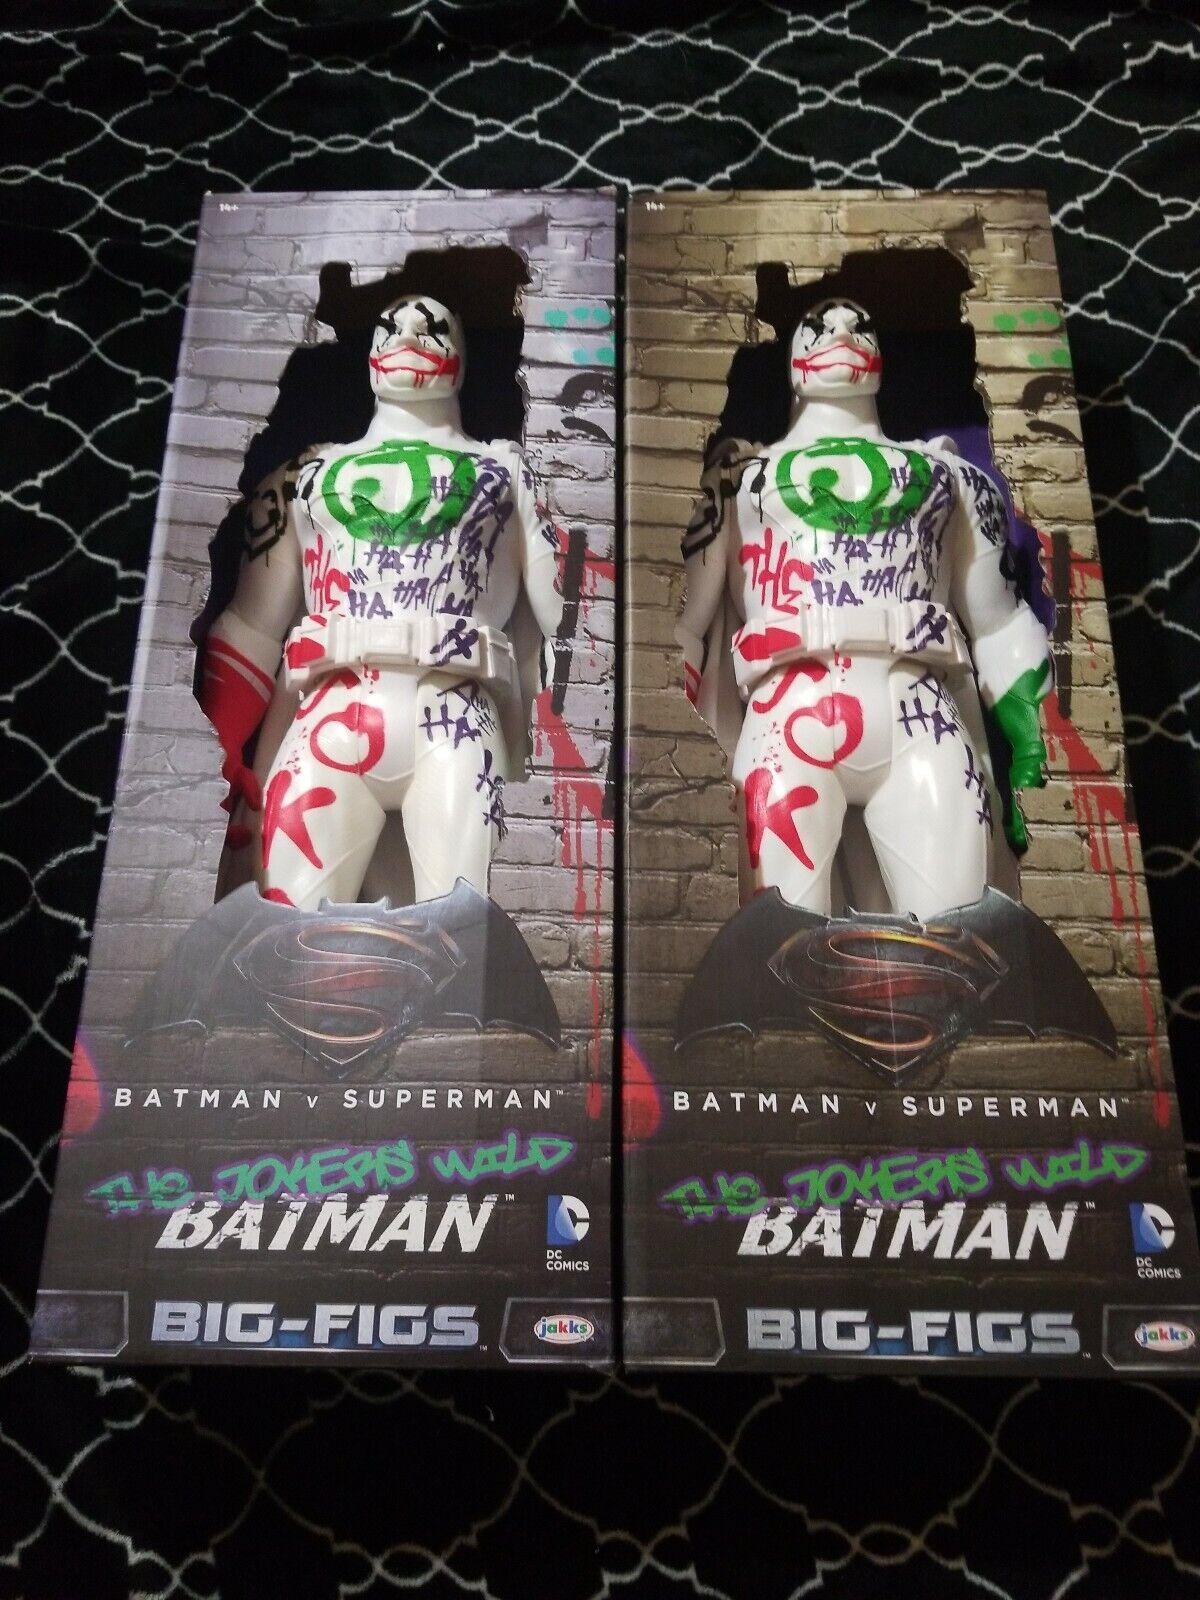 moda clasica Sdcc Jakks Batman súperman Batman el comodines salvaje V V V 19  Entertainment Earth (2)  comprar mejor